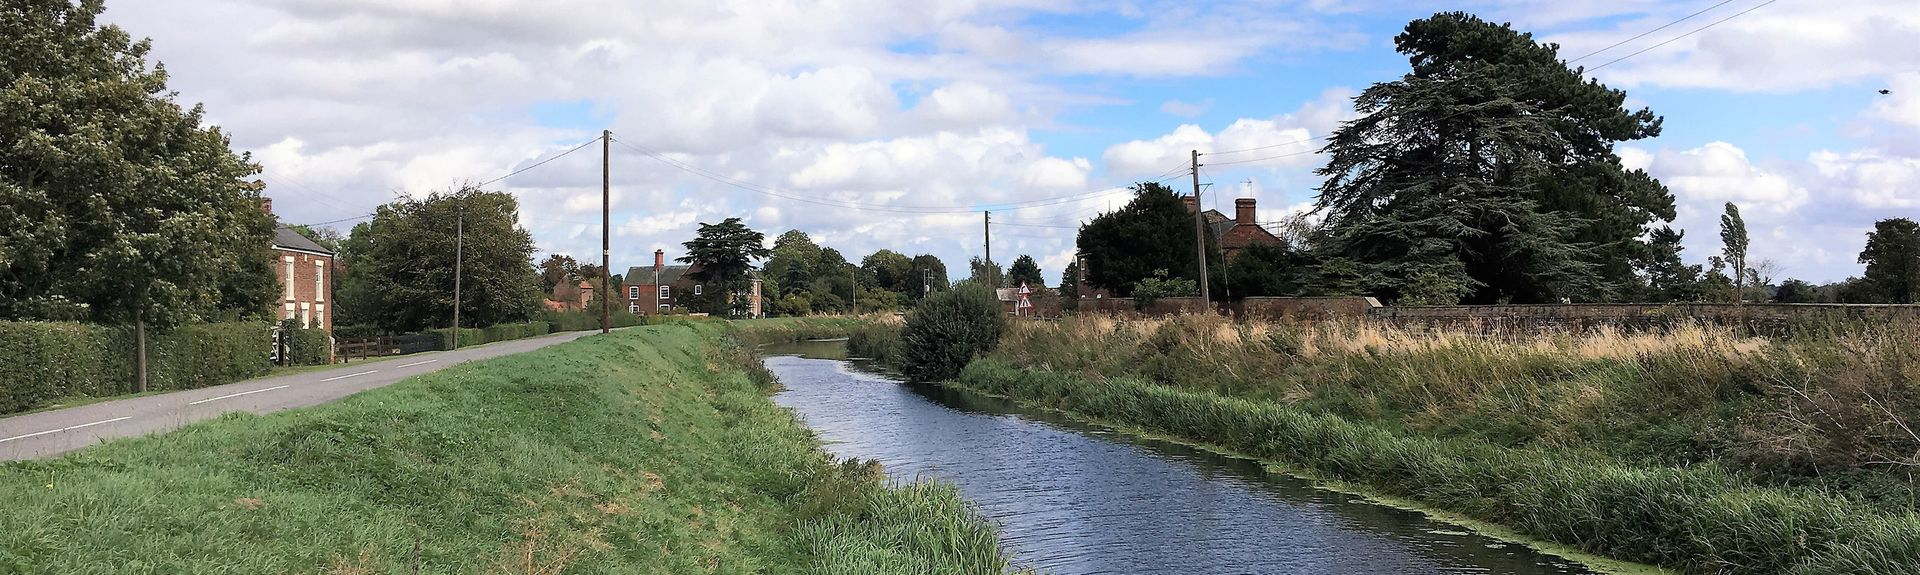 Spalding, Inglaterra, Reino Unido